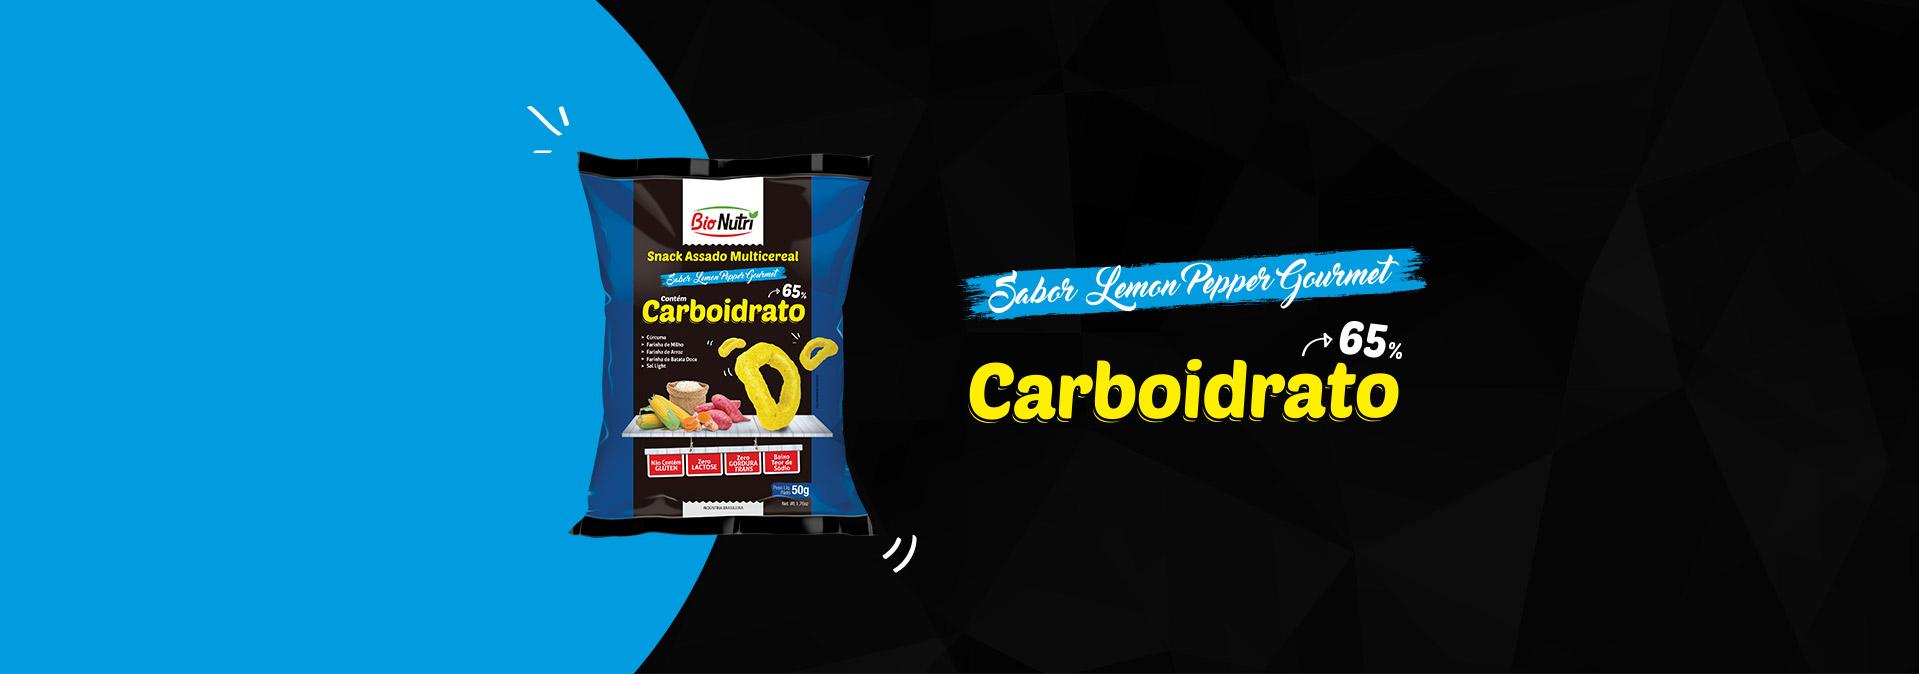 Sabor Lemon Pepepr Gourmet Carboidrato 65%